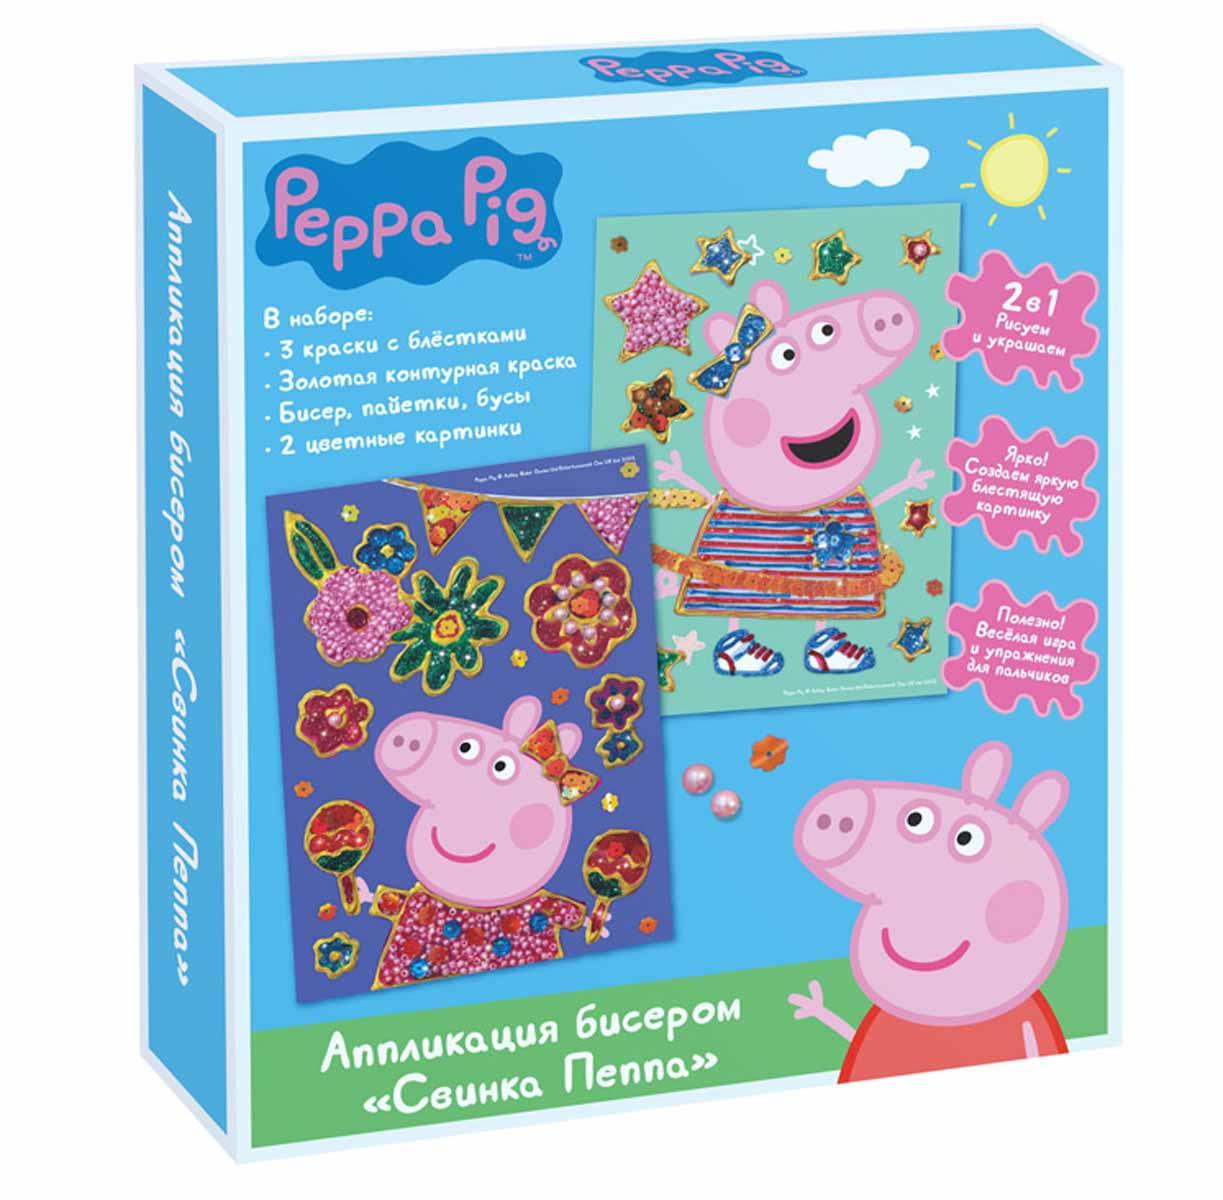 Peppa Pig Аппликация бисером Свинка Пеппа